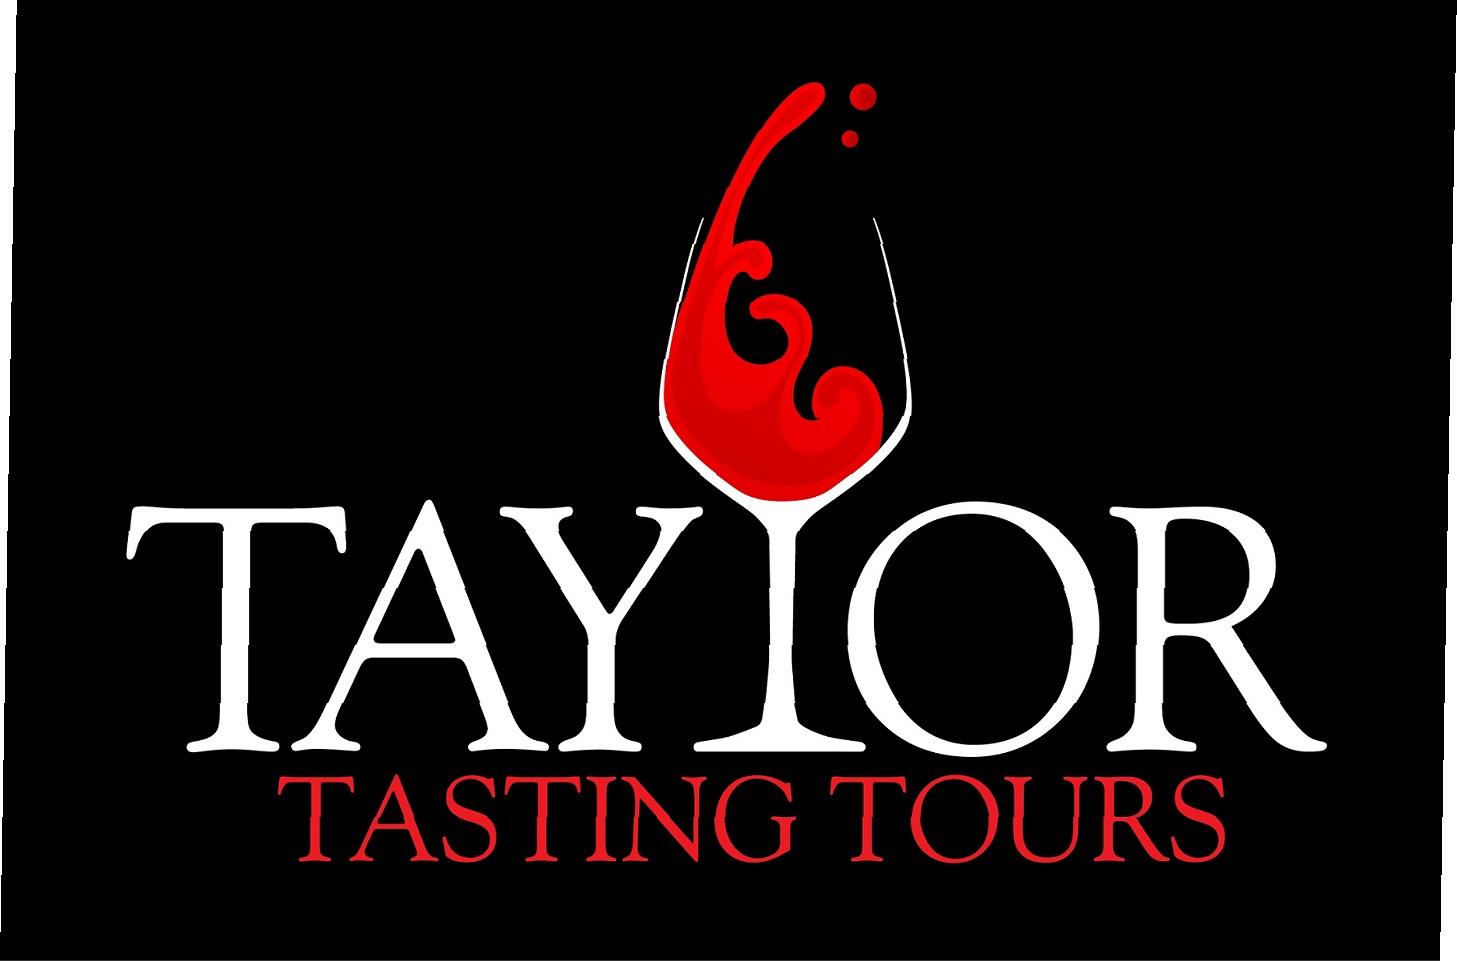 Taylor Tasting Tours